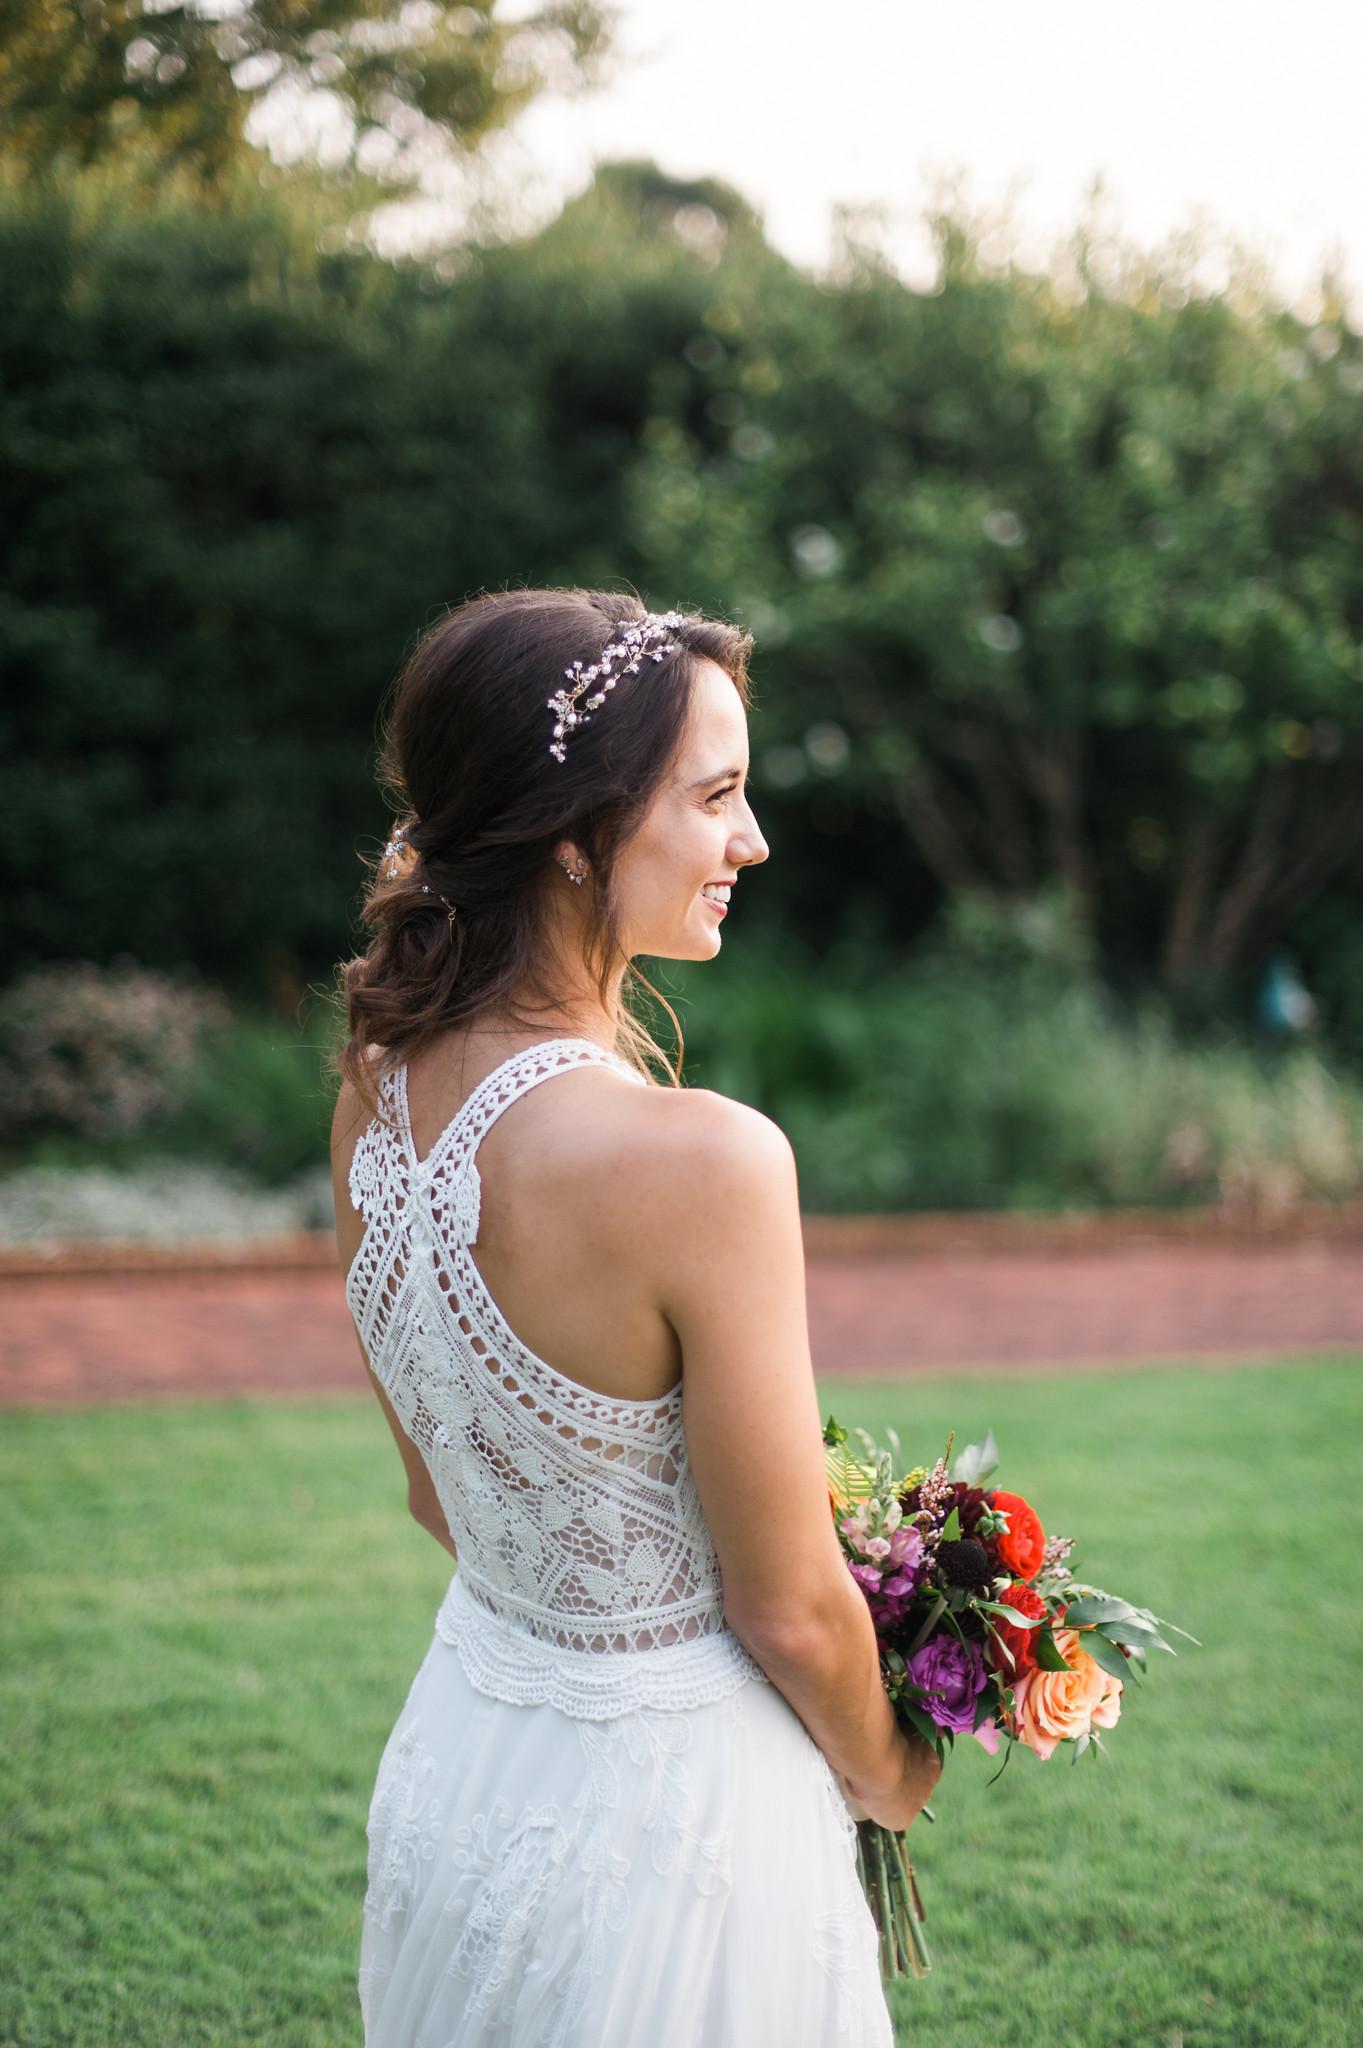 thomas-wedding-079-X4.jpg